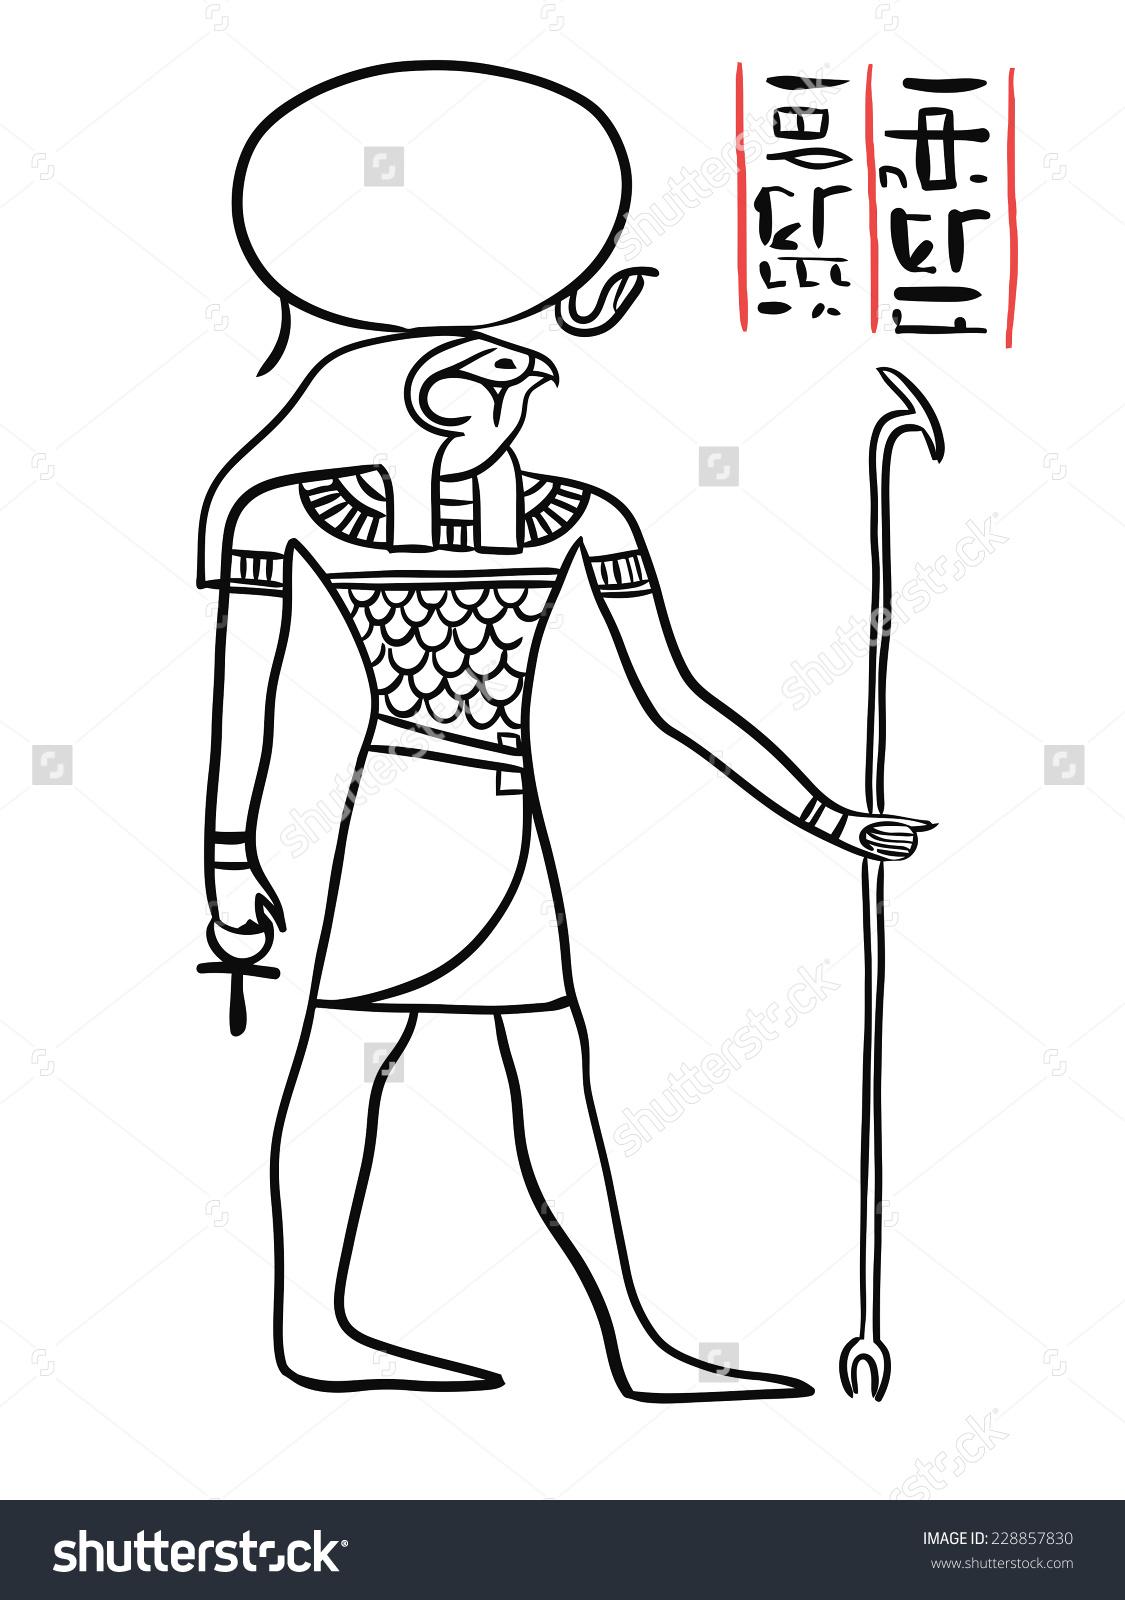 Ra god clipart clipground ra egyptian god illustration black line stock vector 228857830 buycottarizona